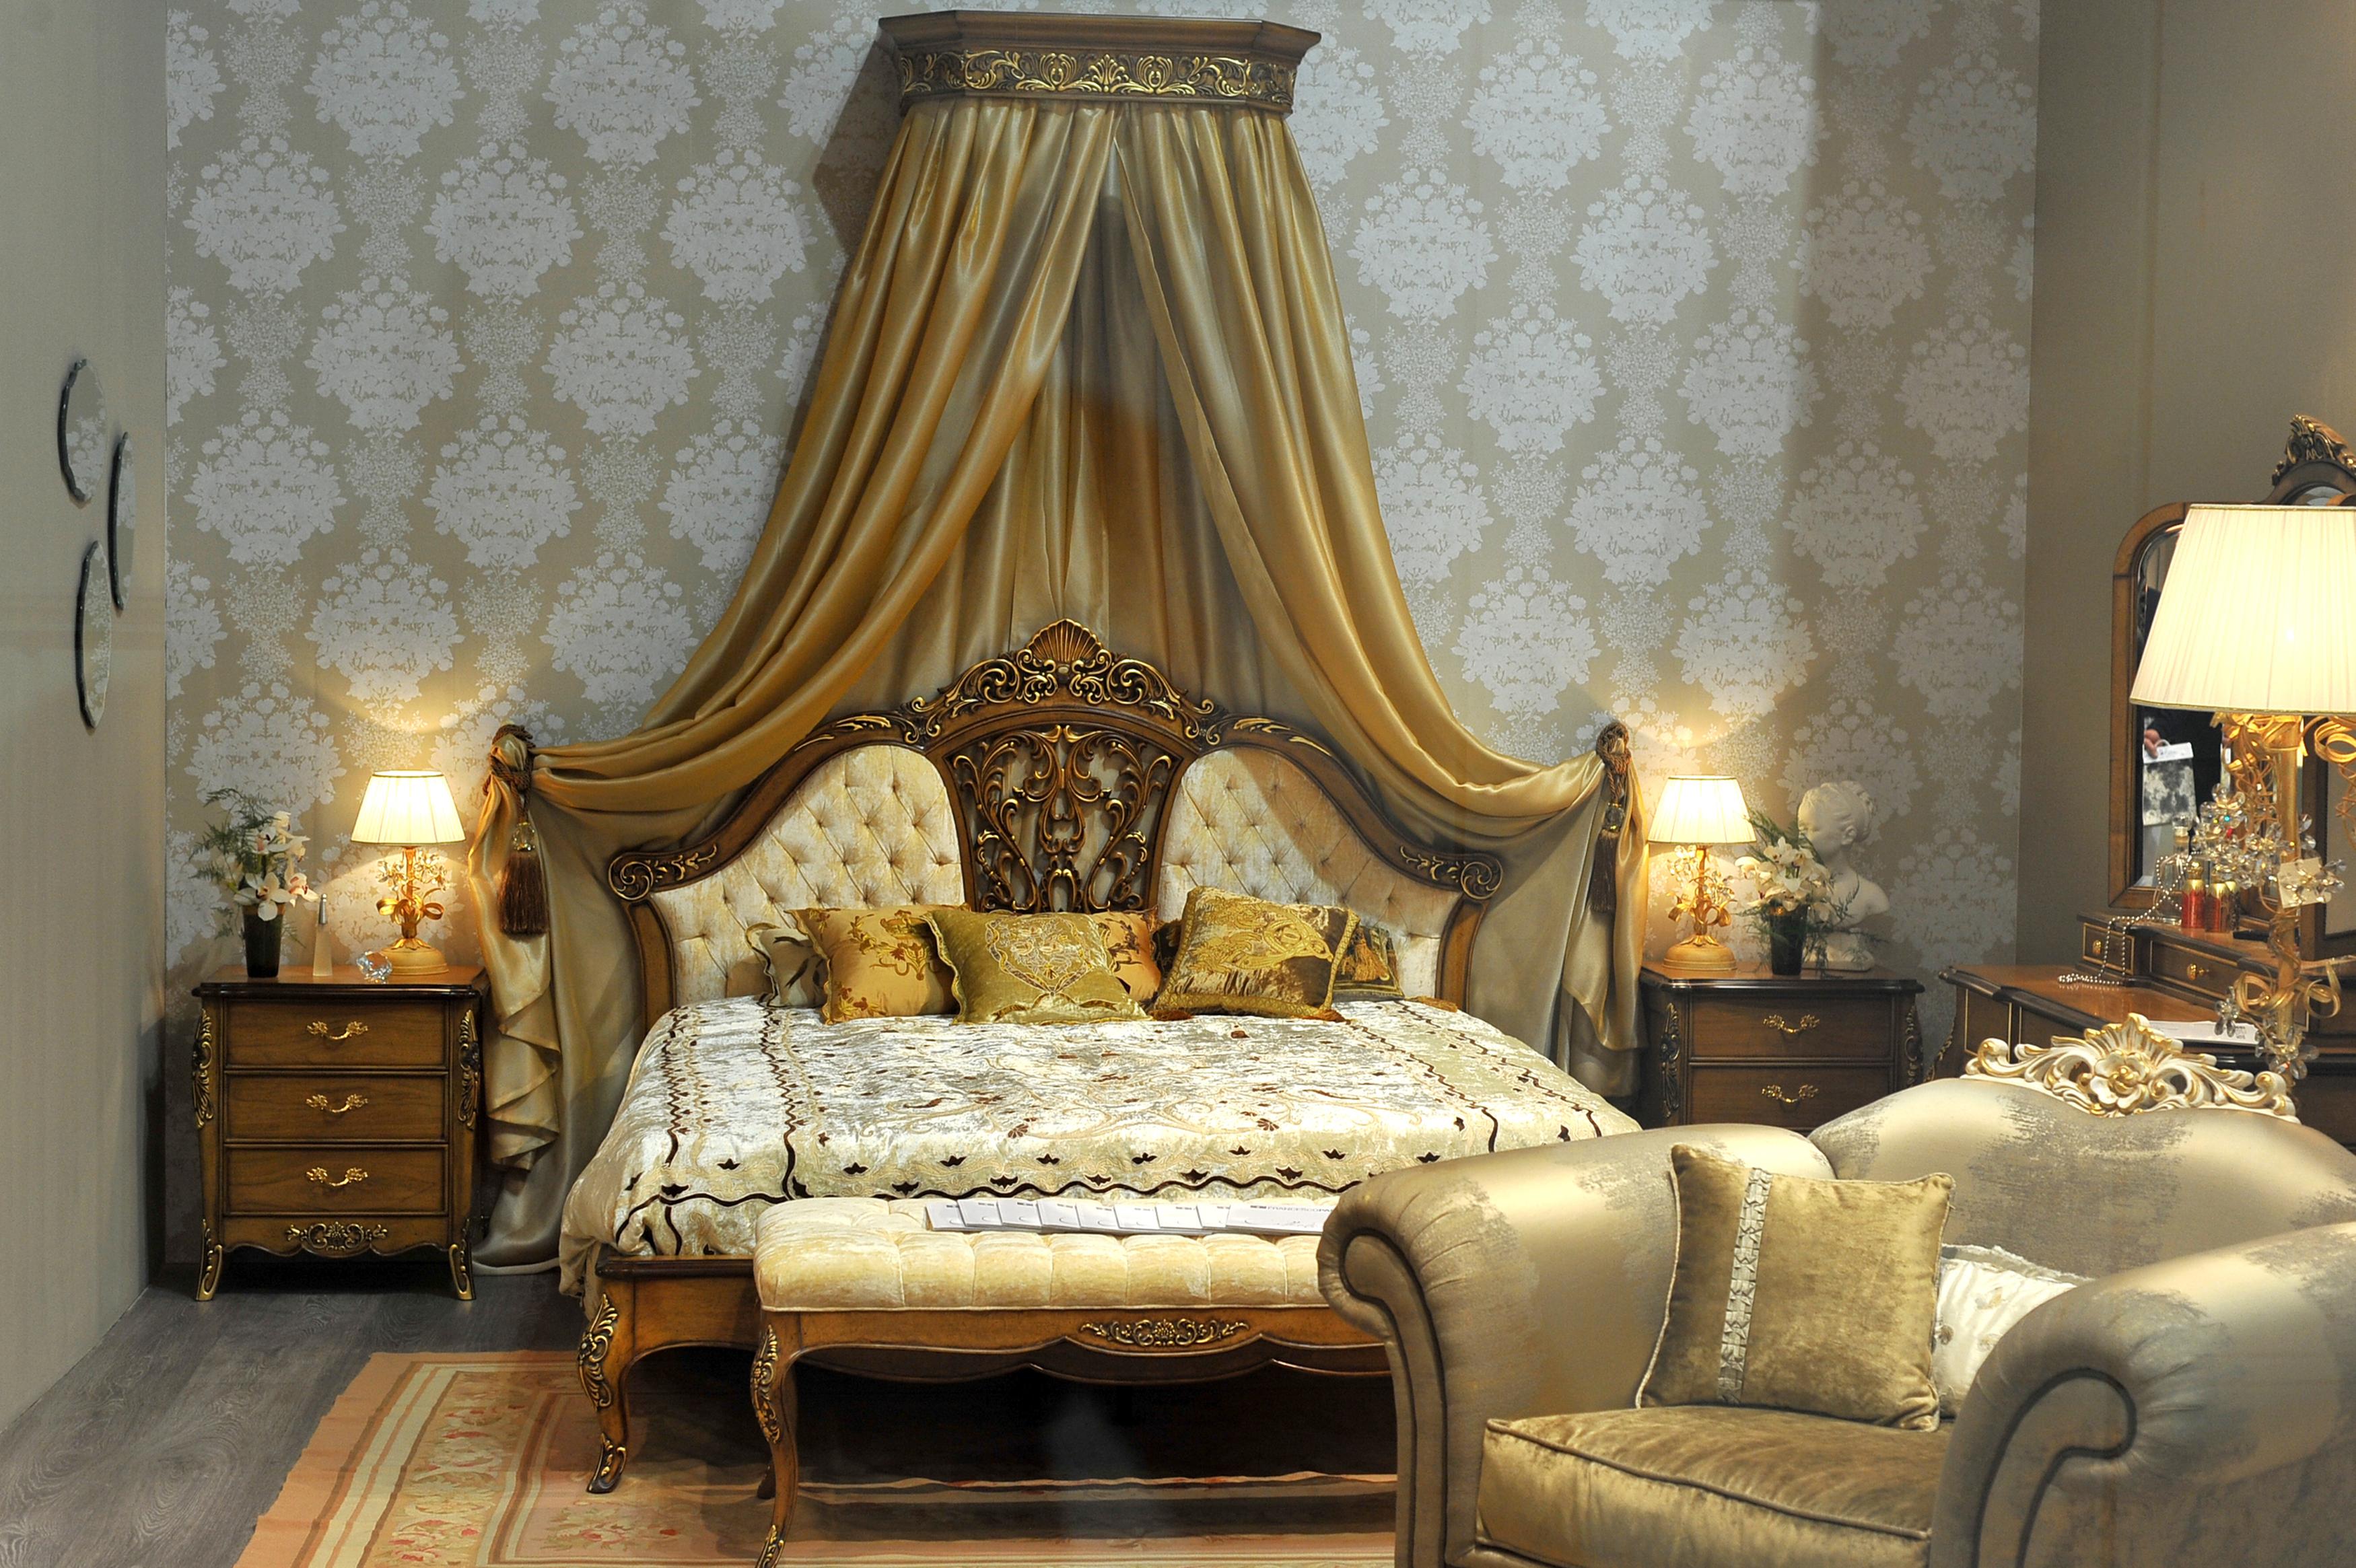 Обои интерьер стиль дизайн спальня